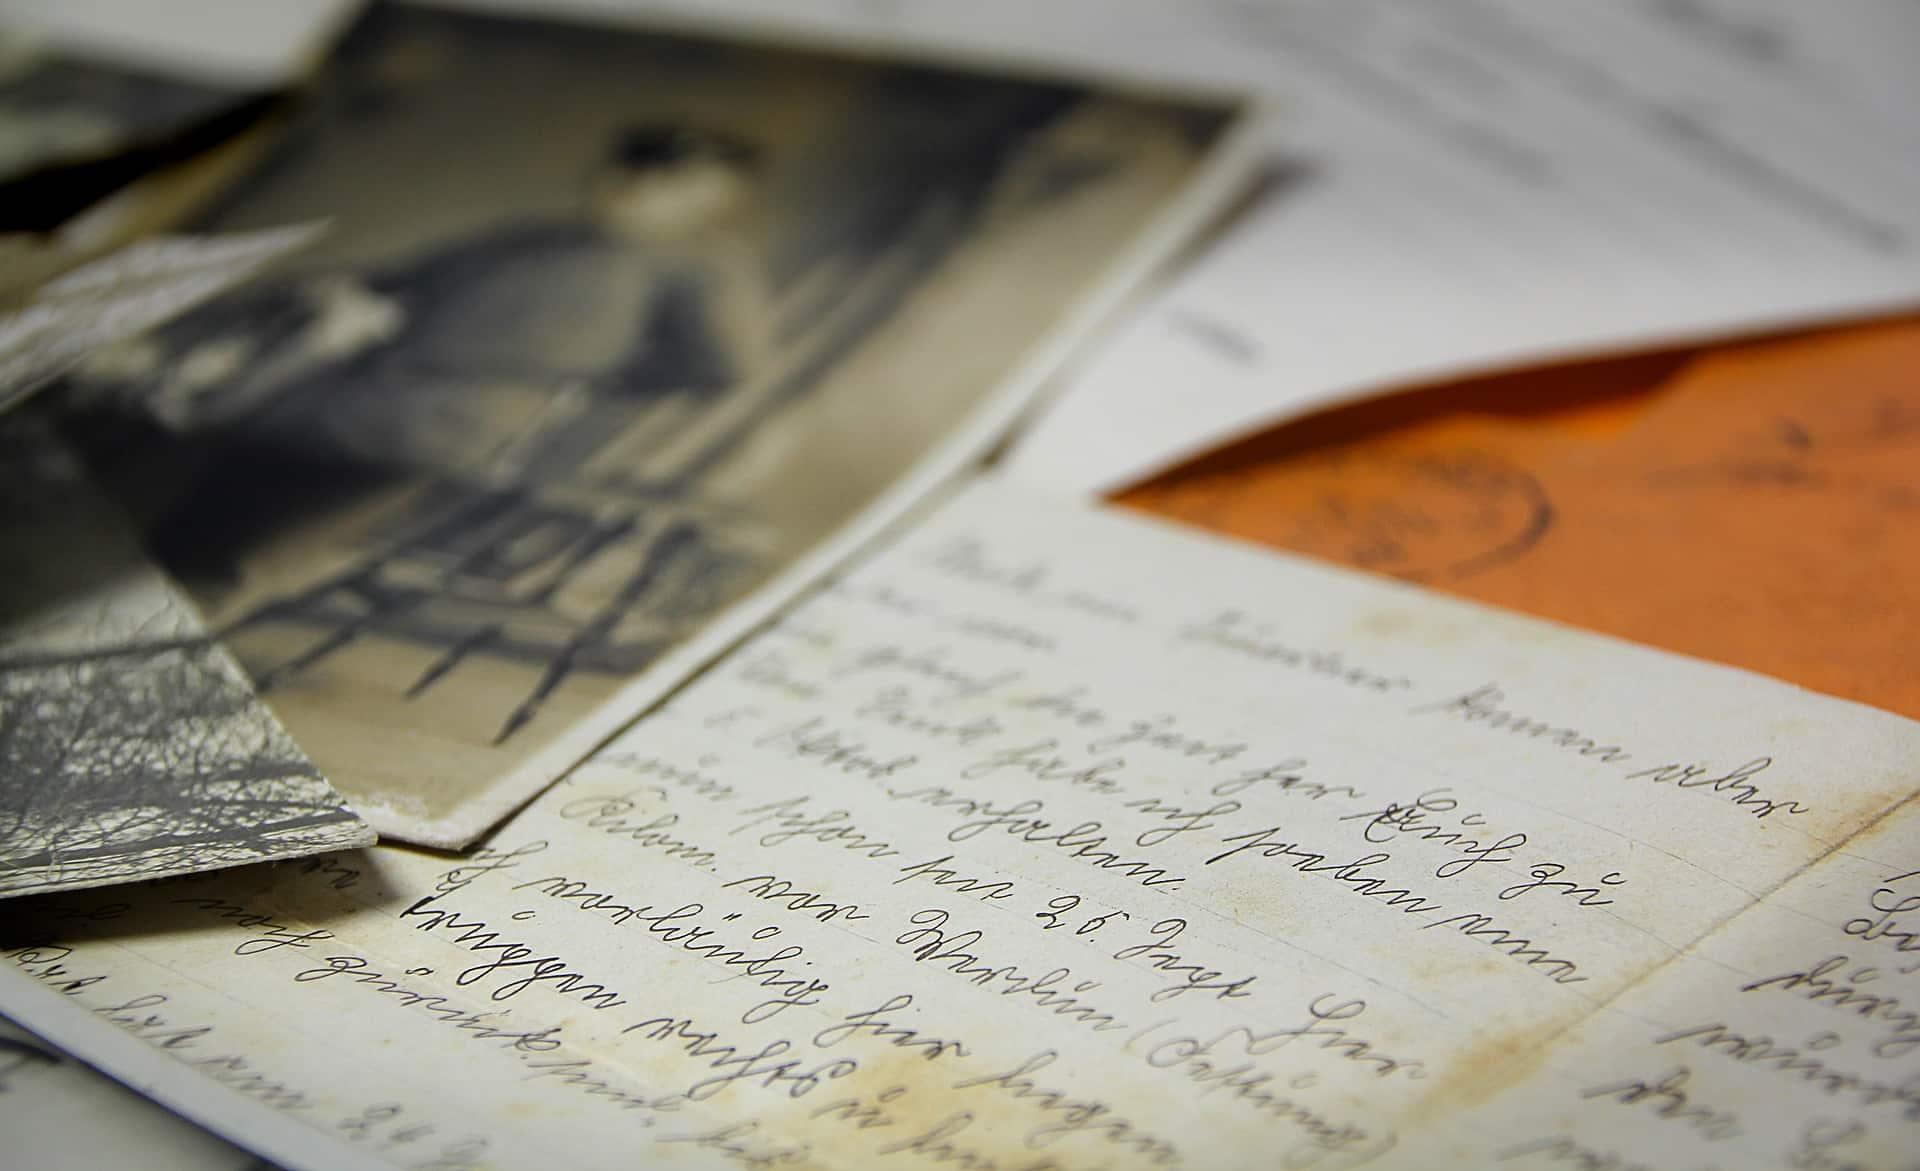 lettere di guerra